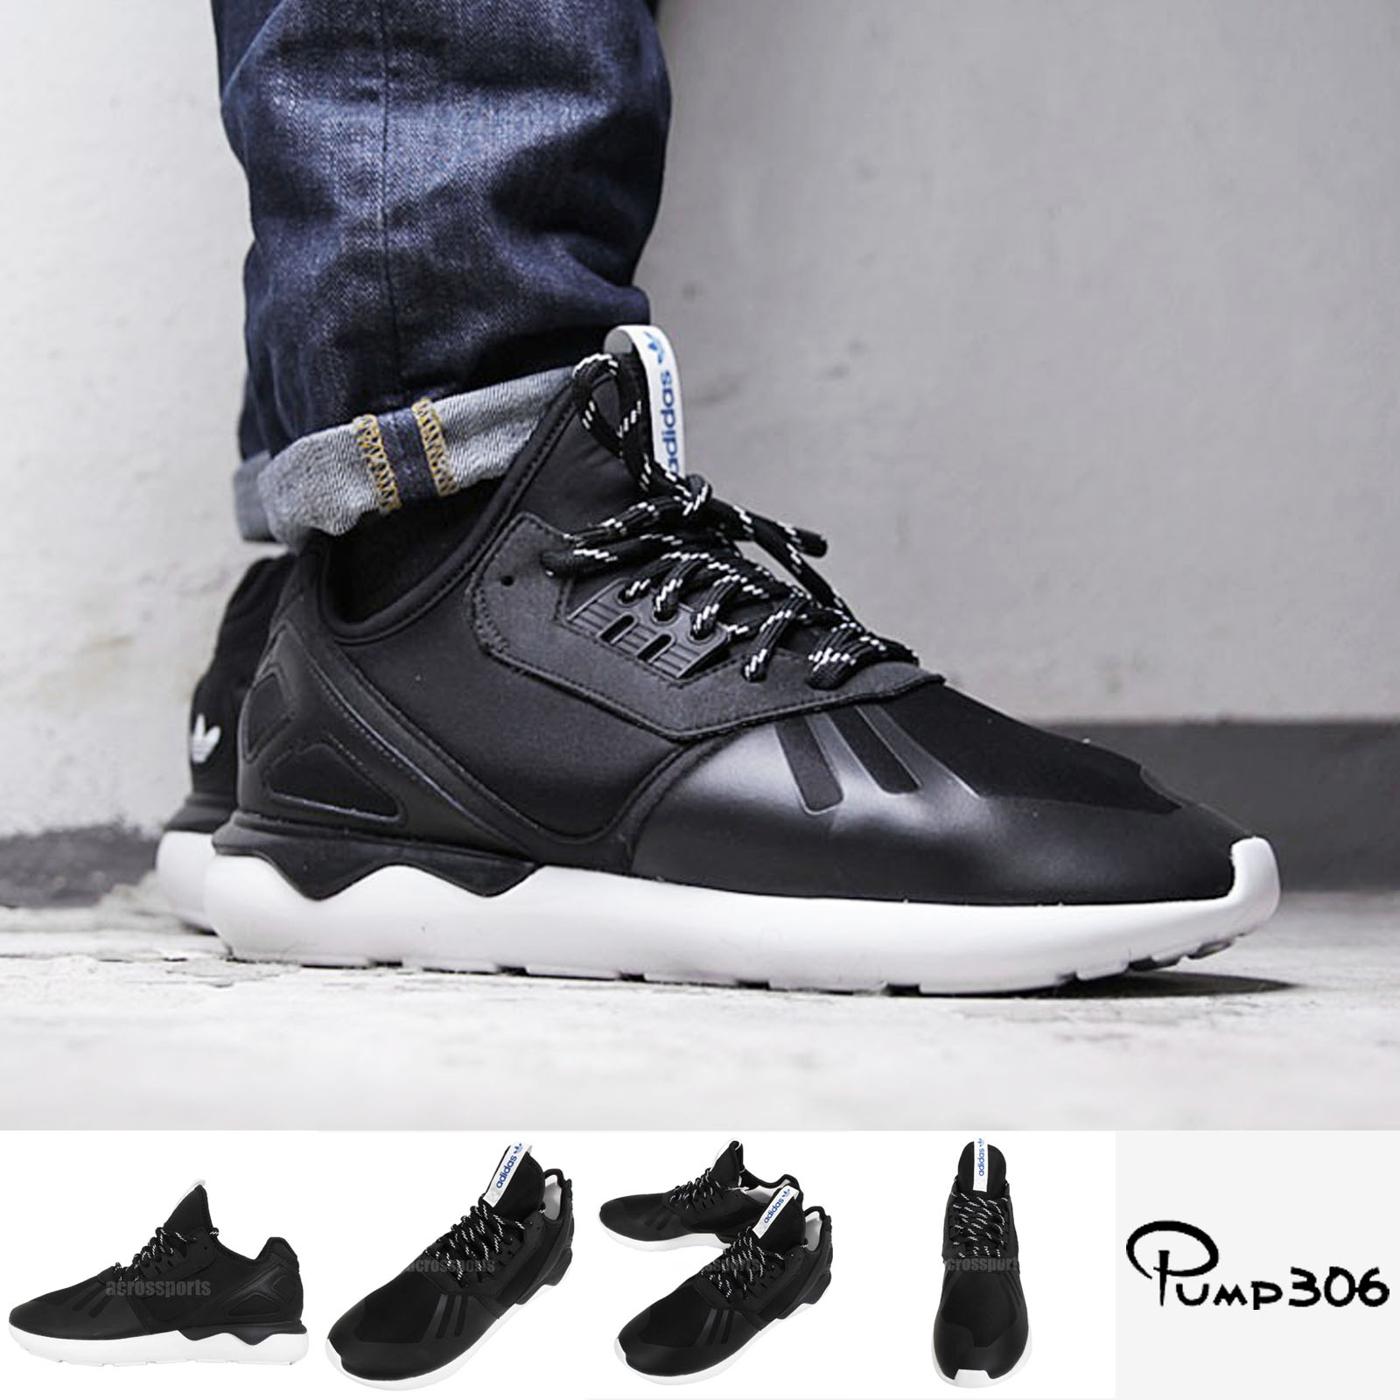 adidas休閒鞋Tubular Runner Y3武士鞋運動黑白男鞋PUMP306 M19648